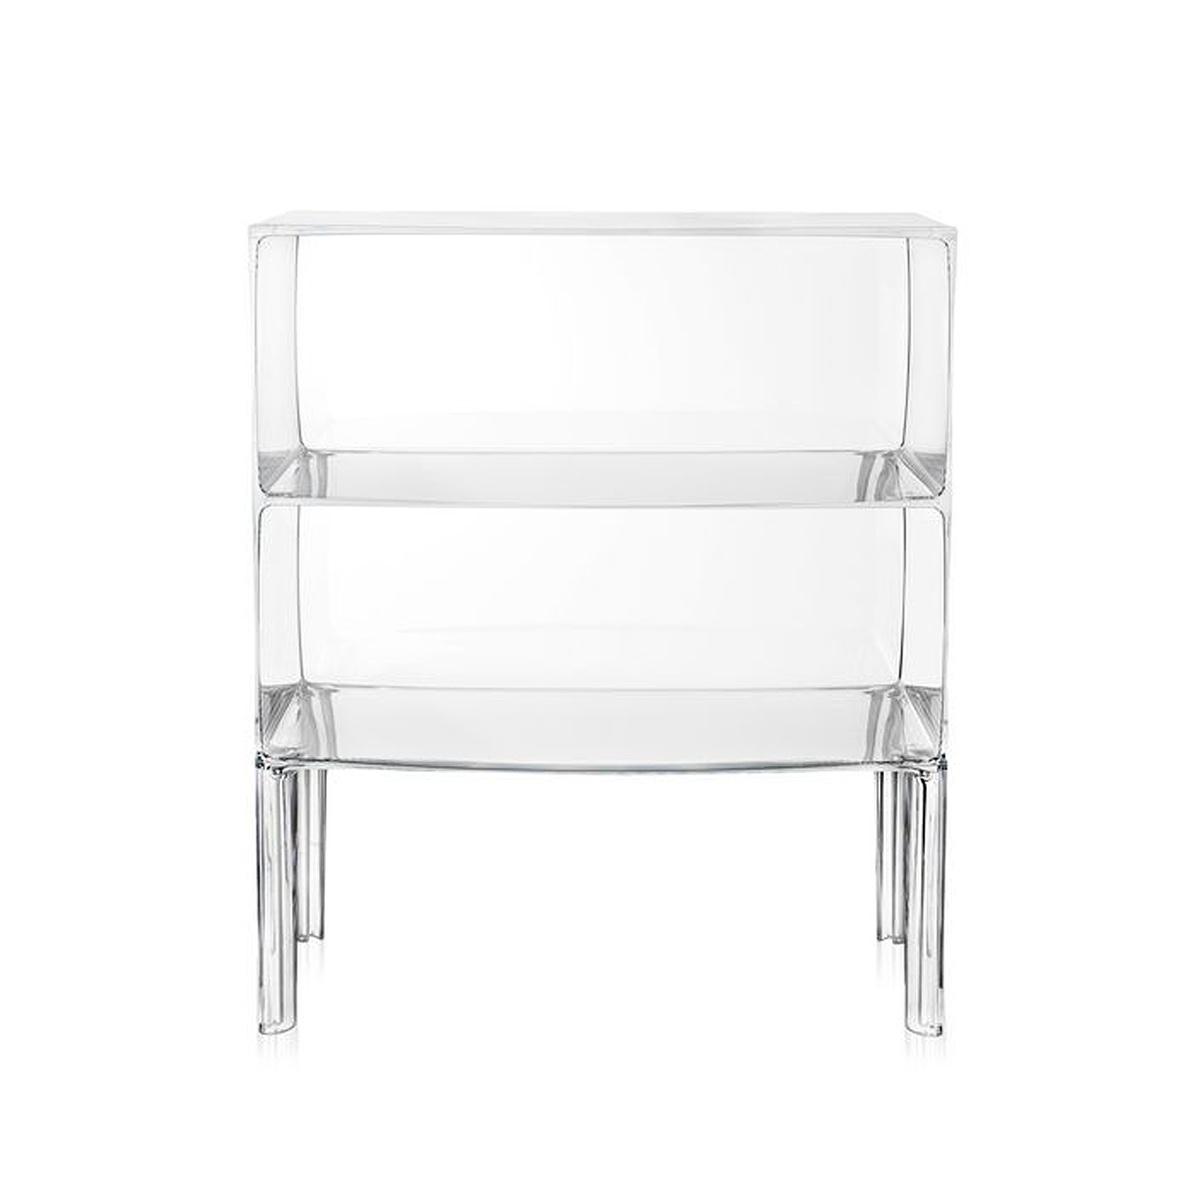 commode ghost buster h 80 cm by kartell lovethesign. Black Bedroom Furniture Sets. Home Design Ideas